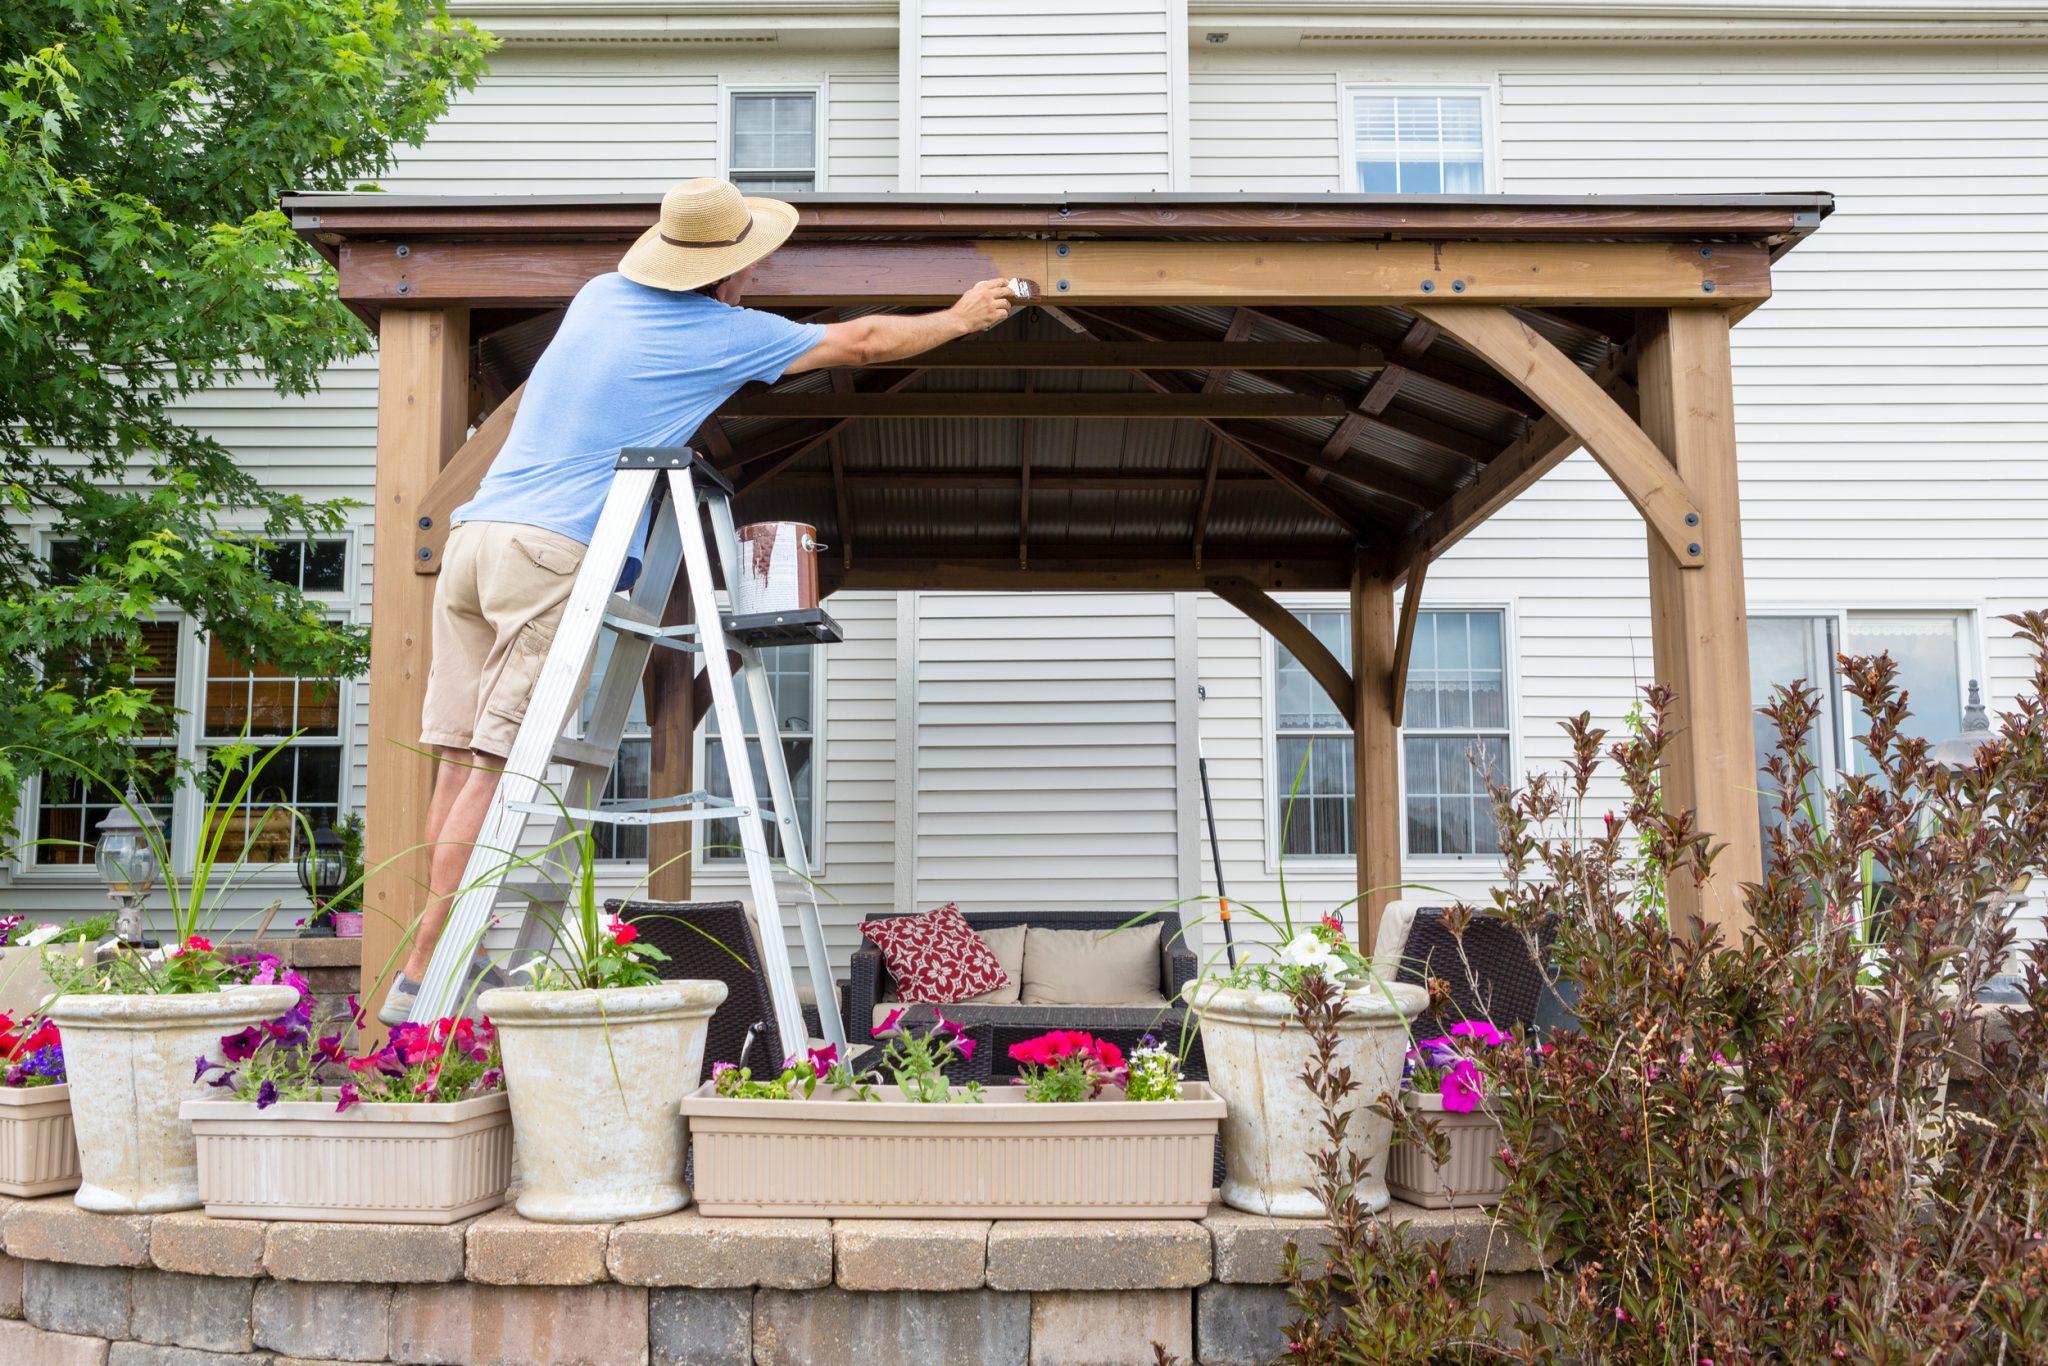 25 Patio Shade Ideas for Your Backyard | INSTALL-IT-DIRECT on Shady Yard Ideas id=78041